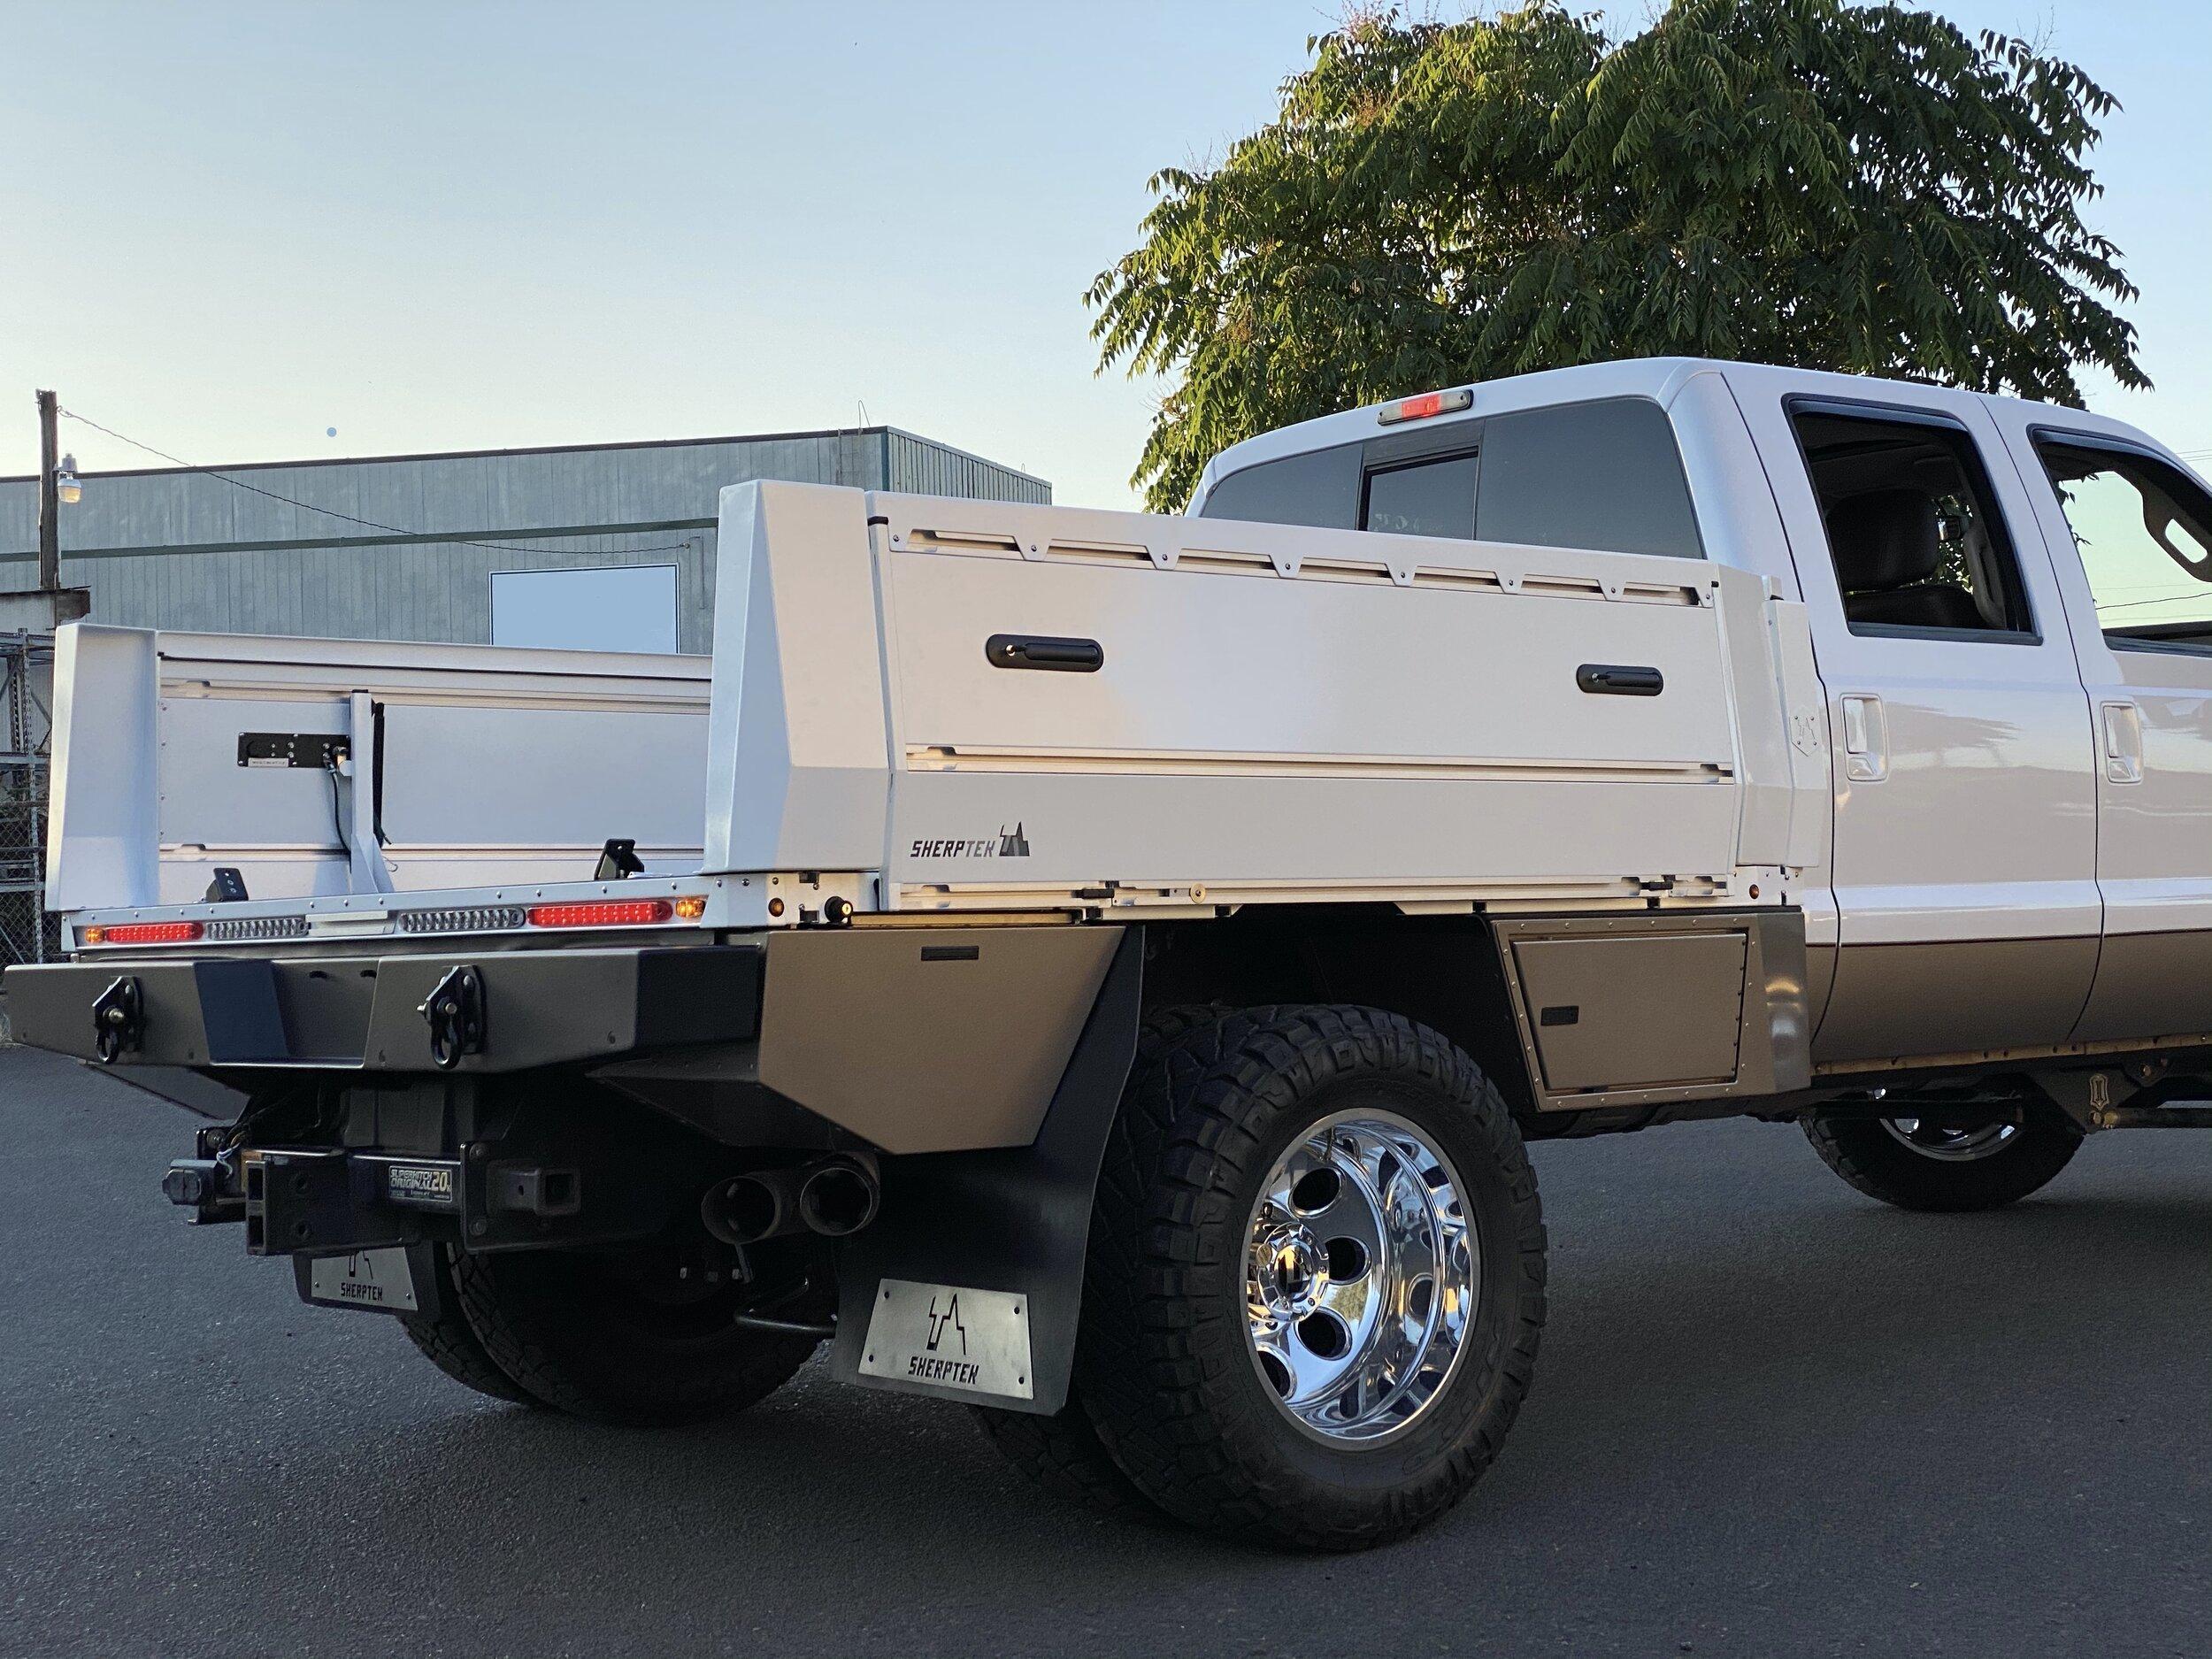 Picture of: Custom Truck Beds Sherptek Sherptek Custom Gear Hauling Solutions Flatbeds Truck Decks And Truck Trays